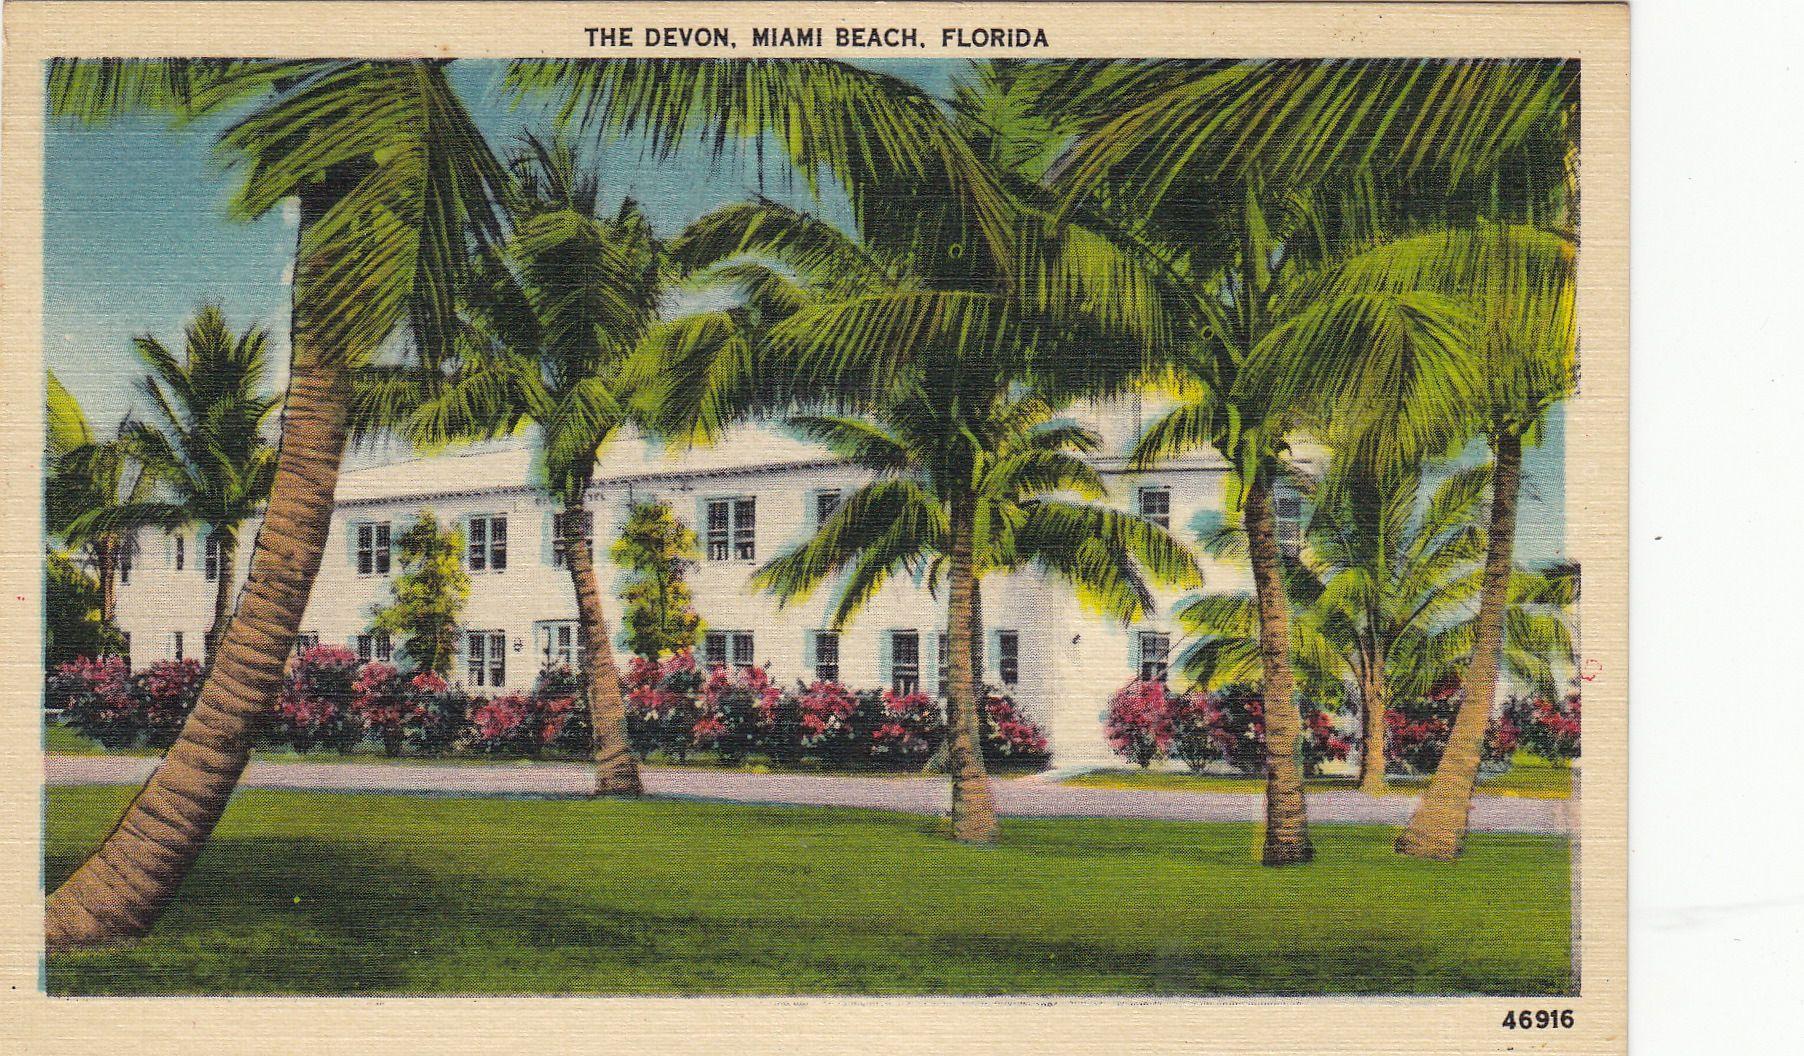 Devon hotel miami beach fl vintage postcards miami for Art deco hotel devon